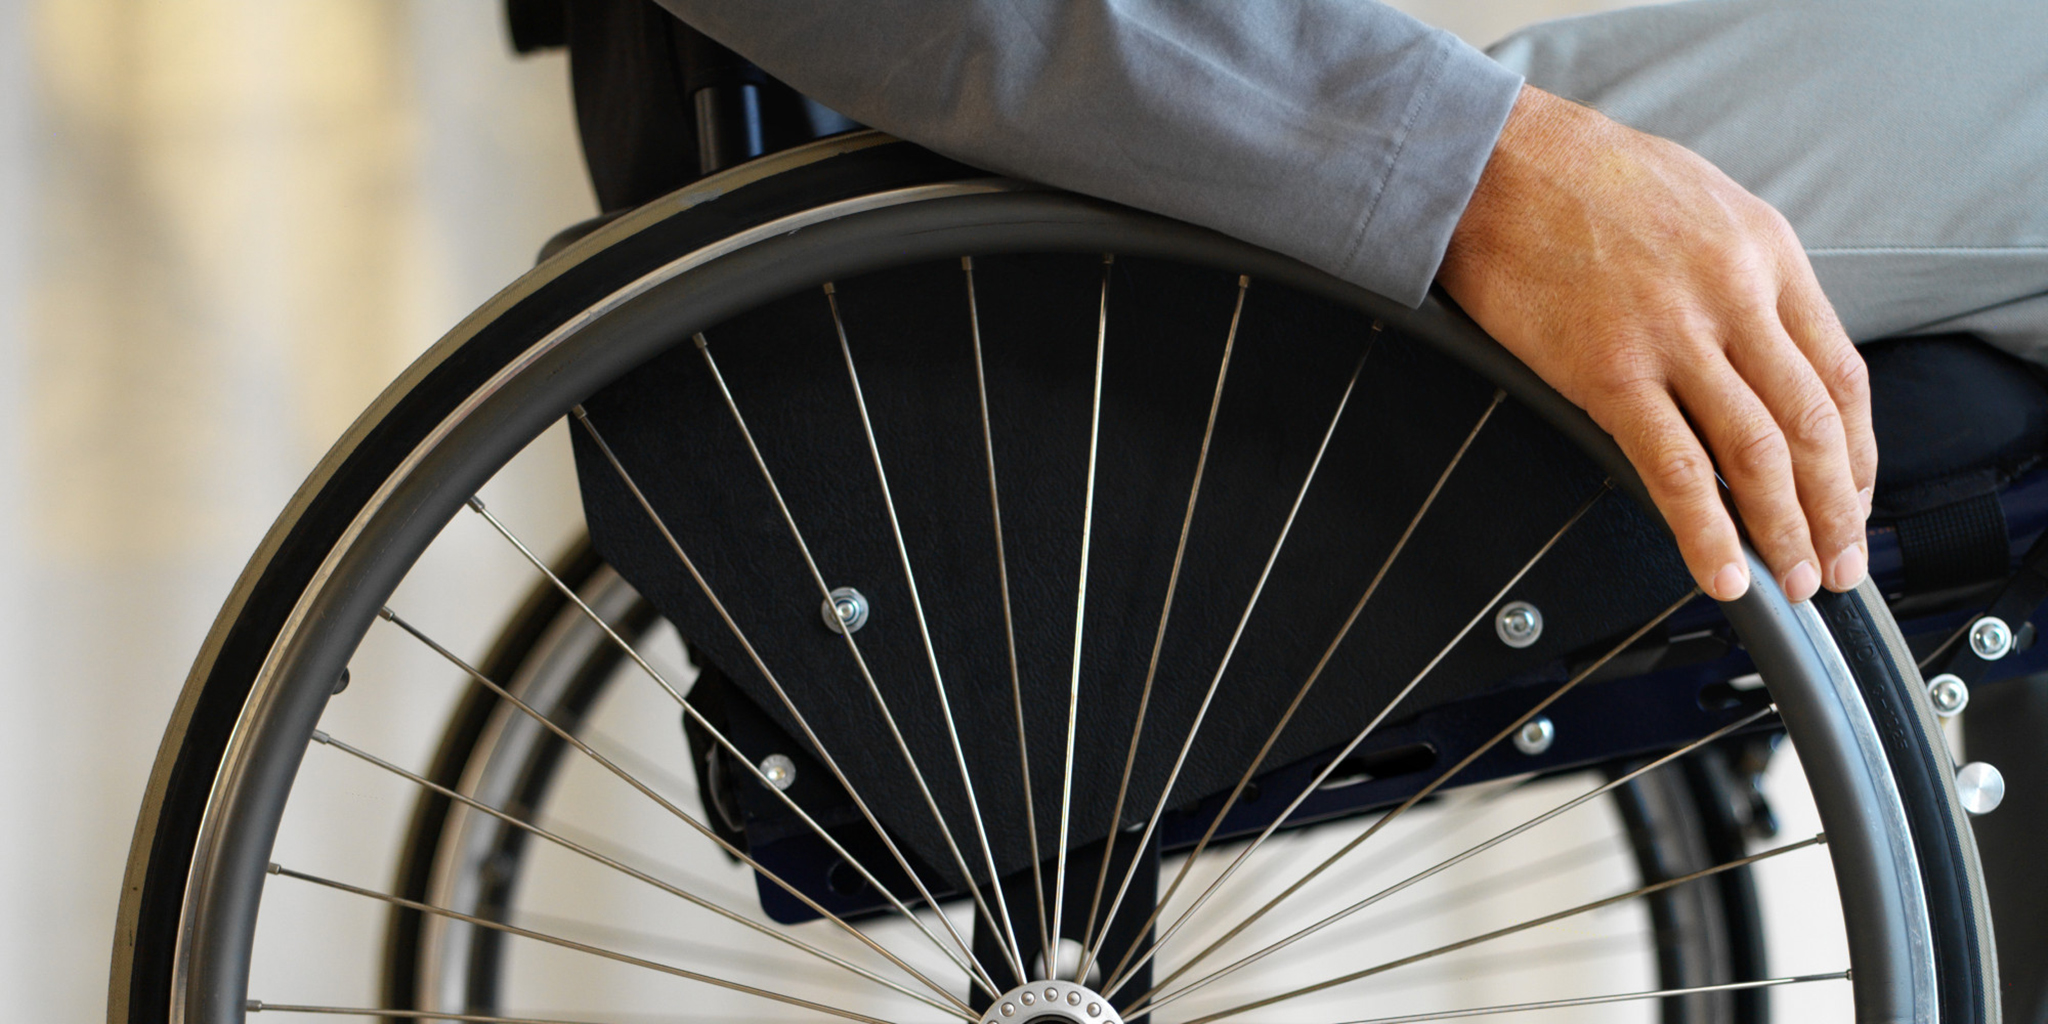 LAG 2017   Apoios a idosos e a portadores de deficiência aumentam